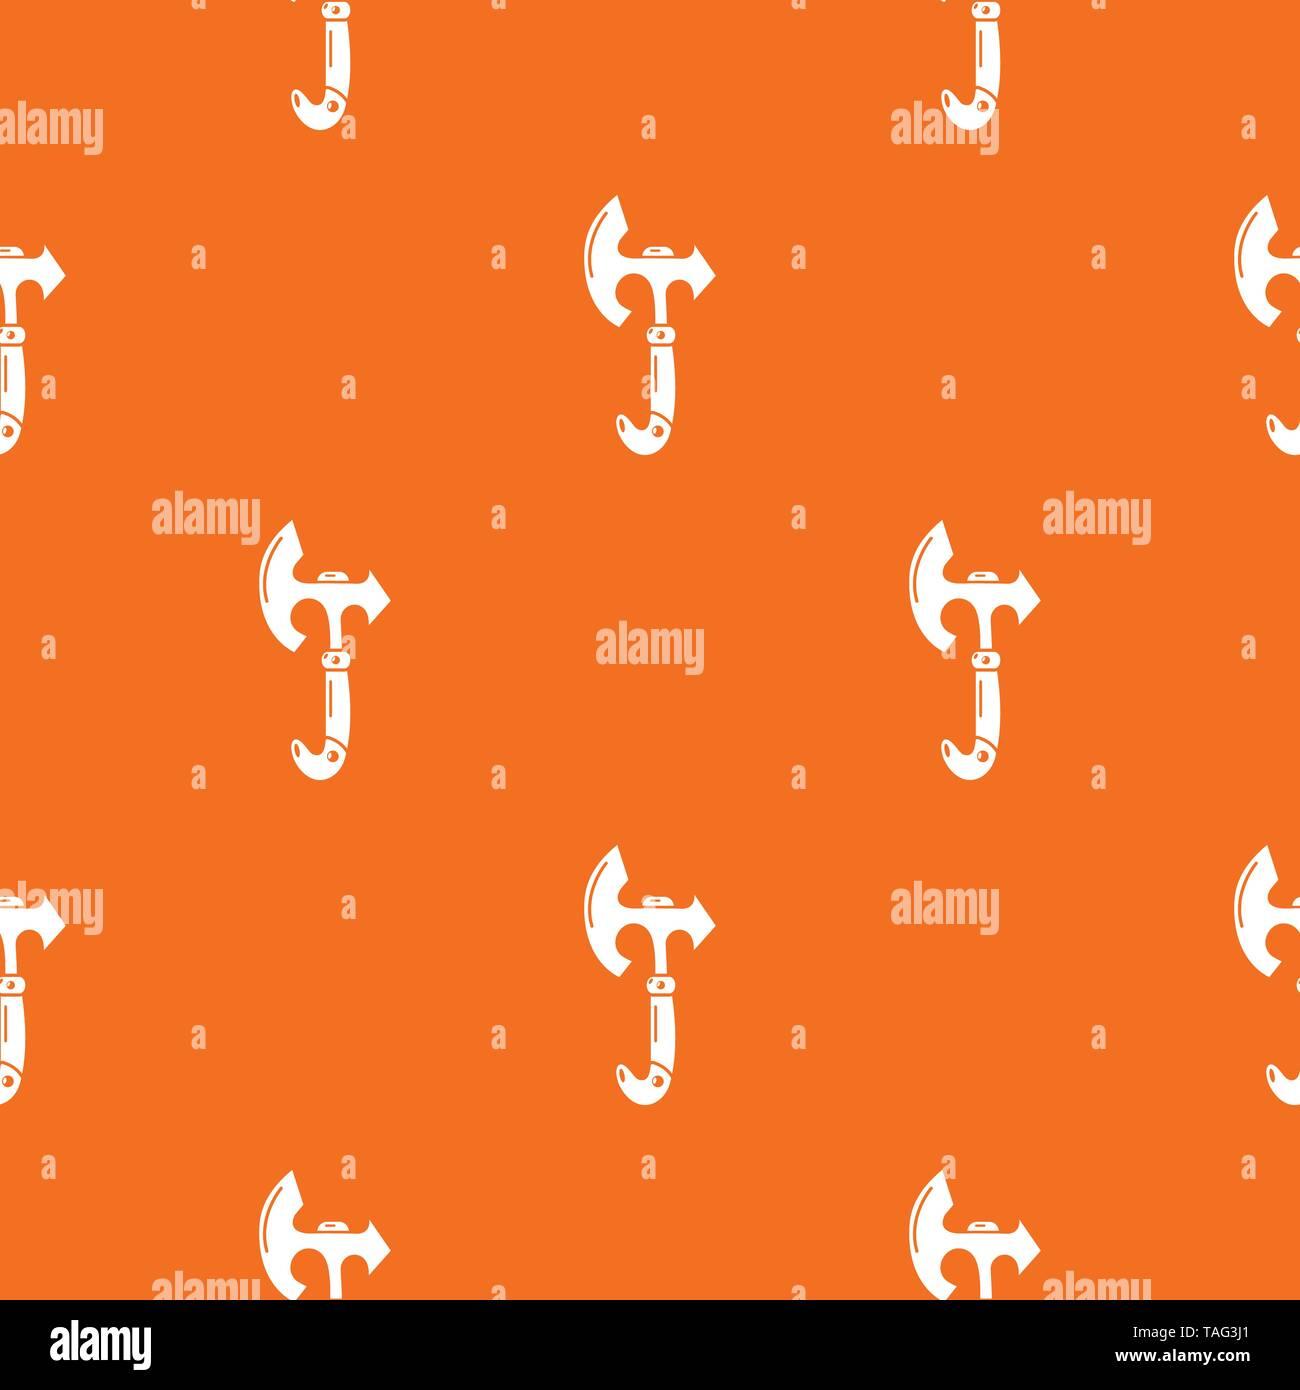 Ax heavy pattern vector orange - Stock Image